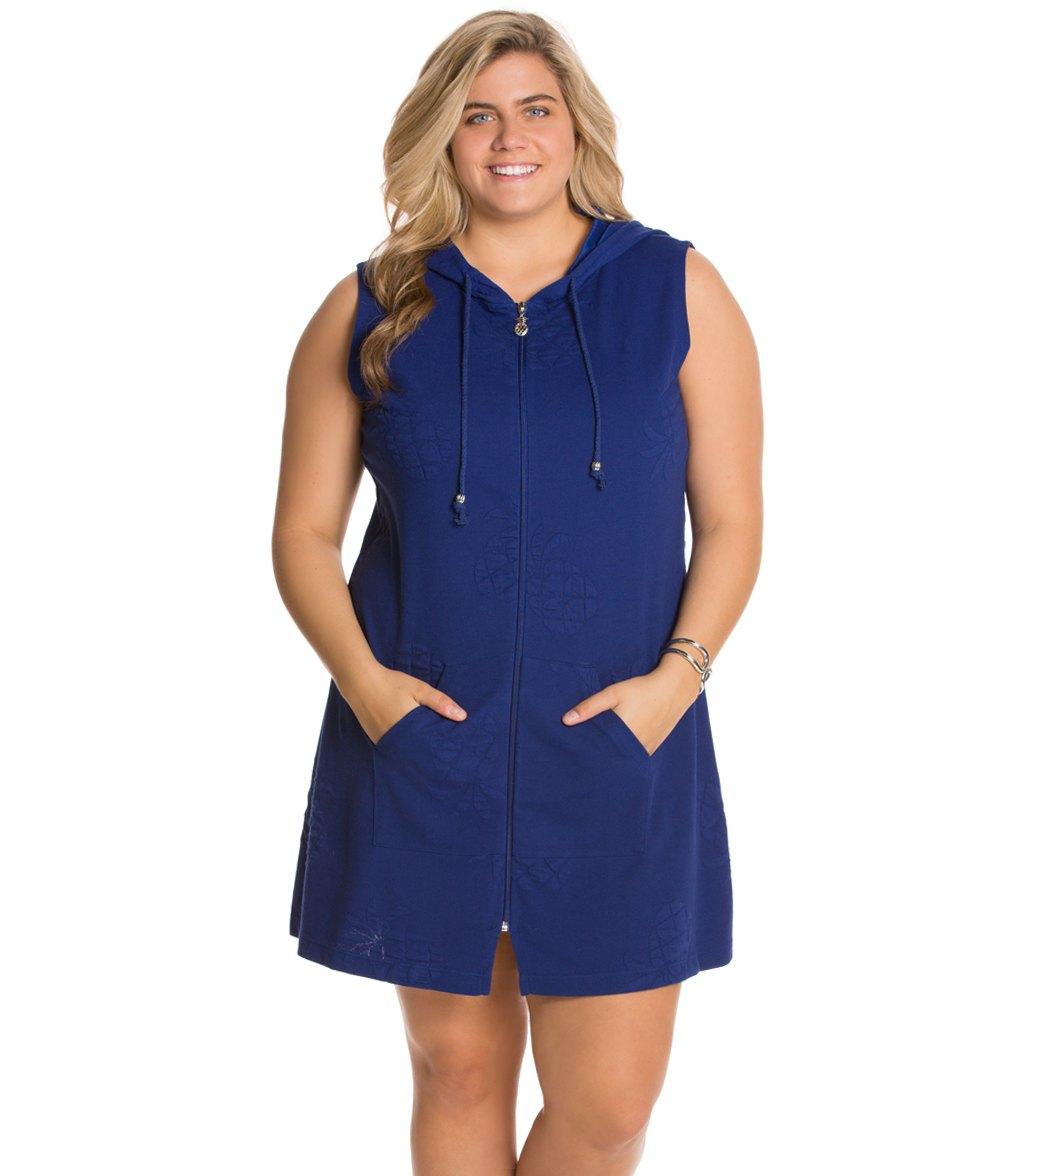 febfe9d6d0 Dotti Plus Size Pineapple Delight Zip Up Hoodie Dress at SwimOutlet ...